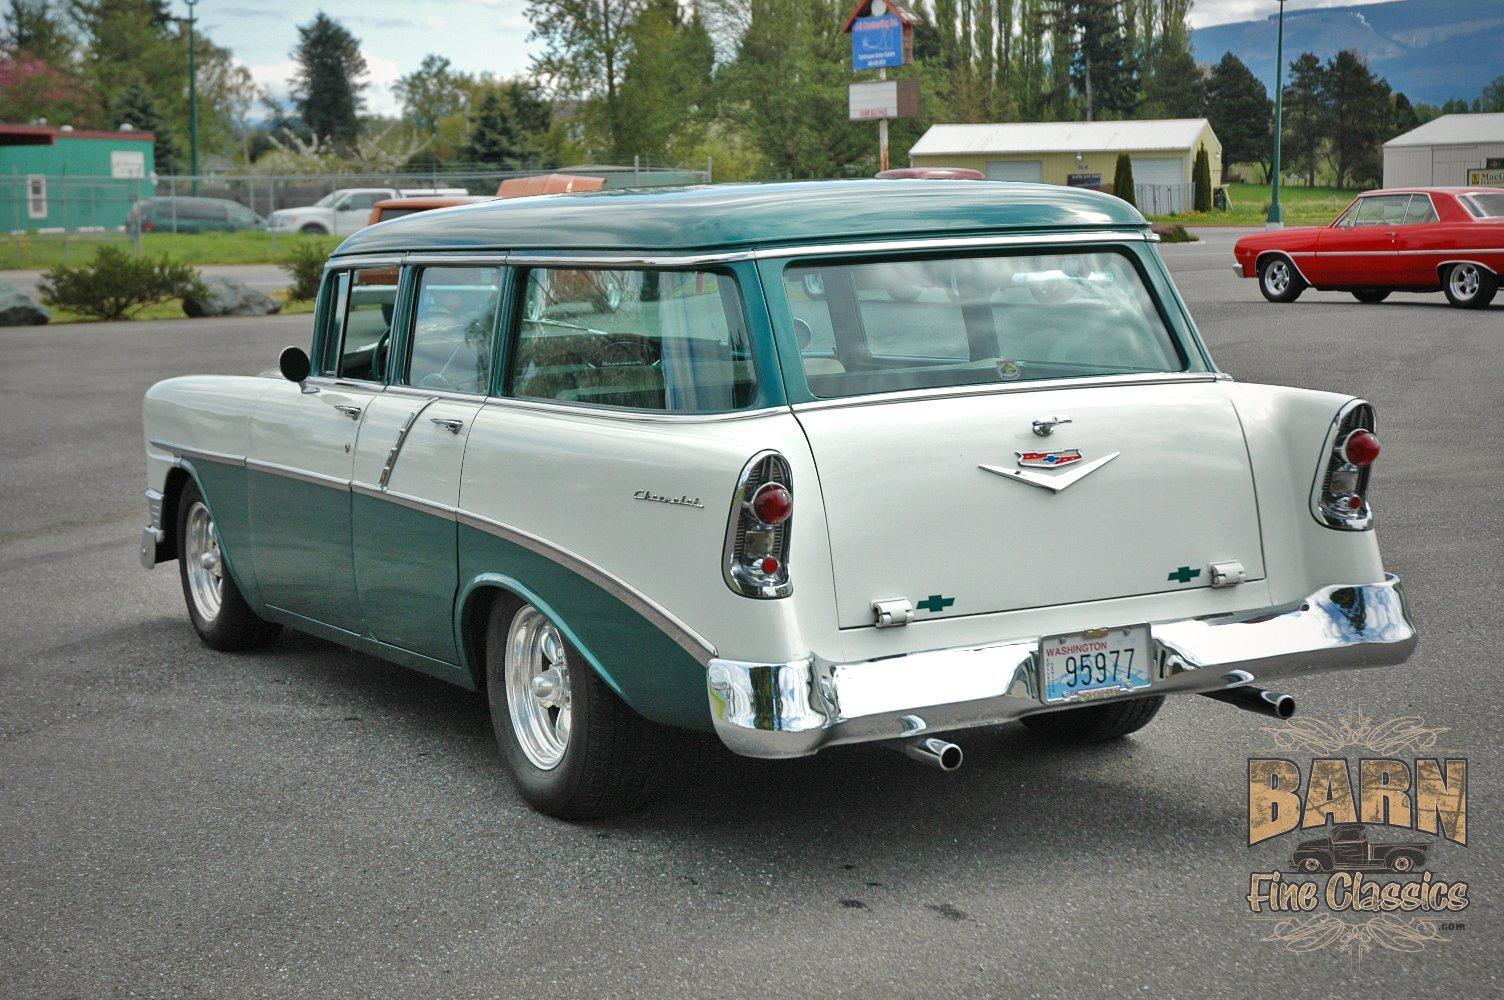 1956 Chevrolet Chevy 210 Bel Air Belair Nomad Four Door Wagon Hotrod 1966 Streetrod Hot Rod Street Rodder Usa 1500x1000 01 Wallpaper 1504x1000 937562